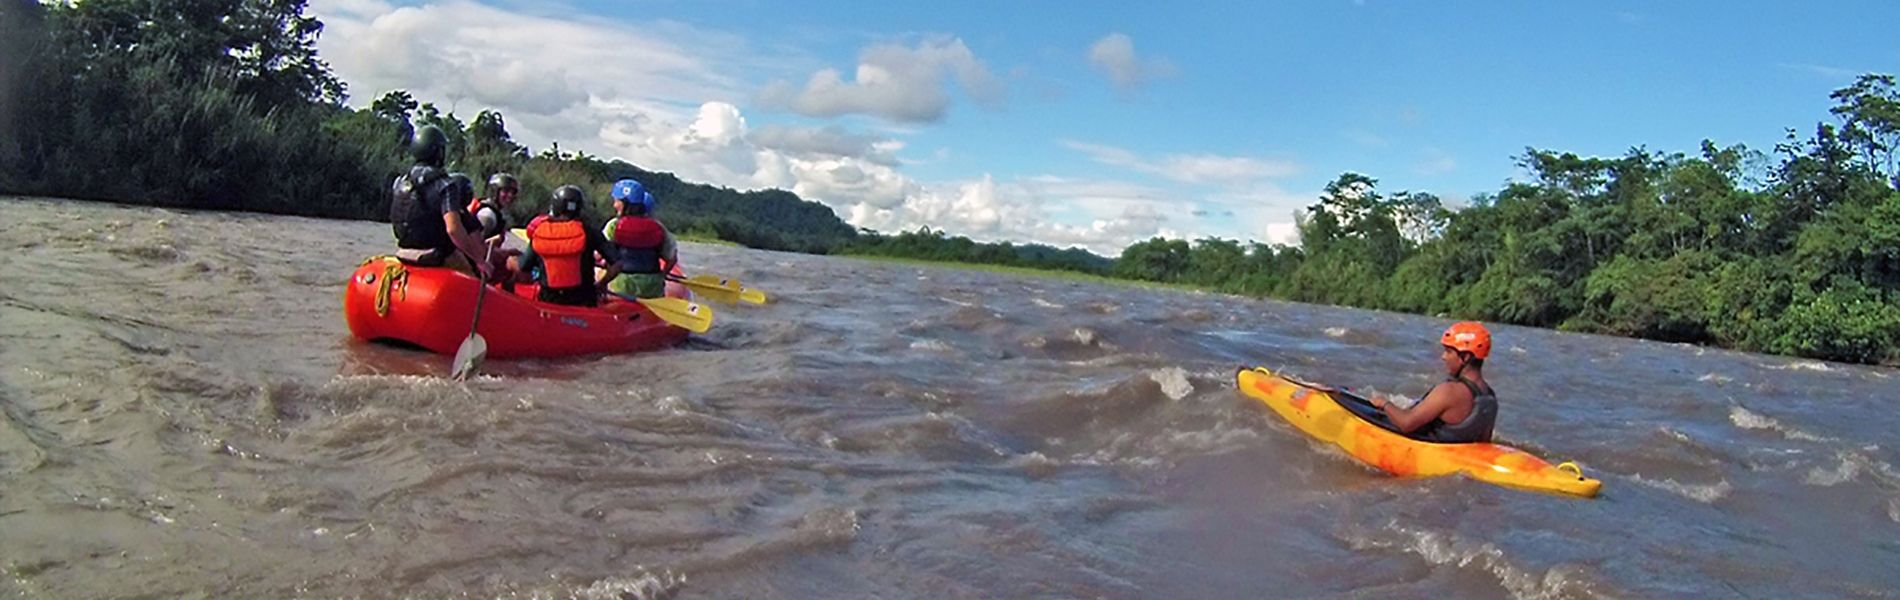 Rafting Jatunyacu River